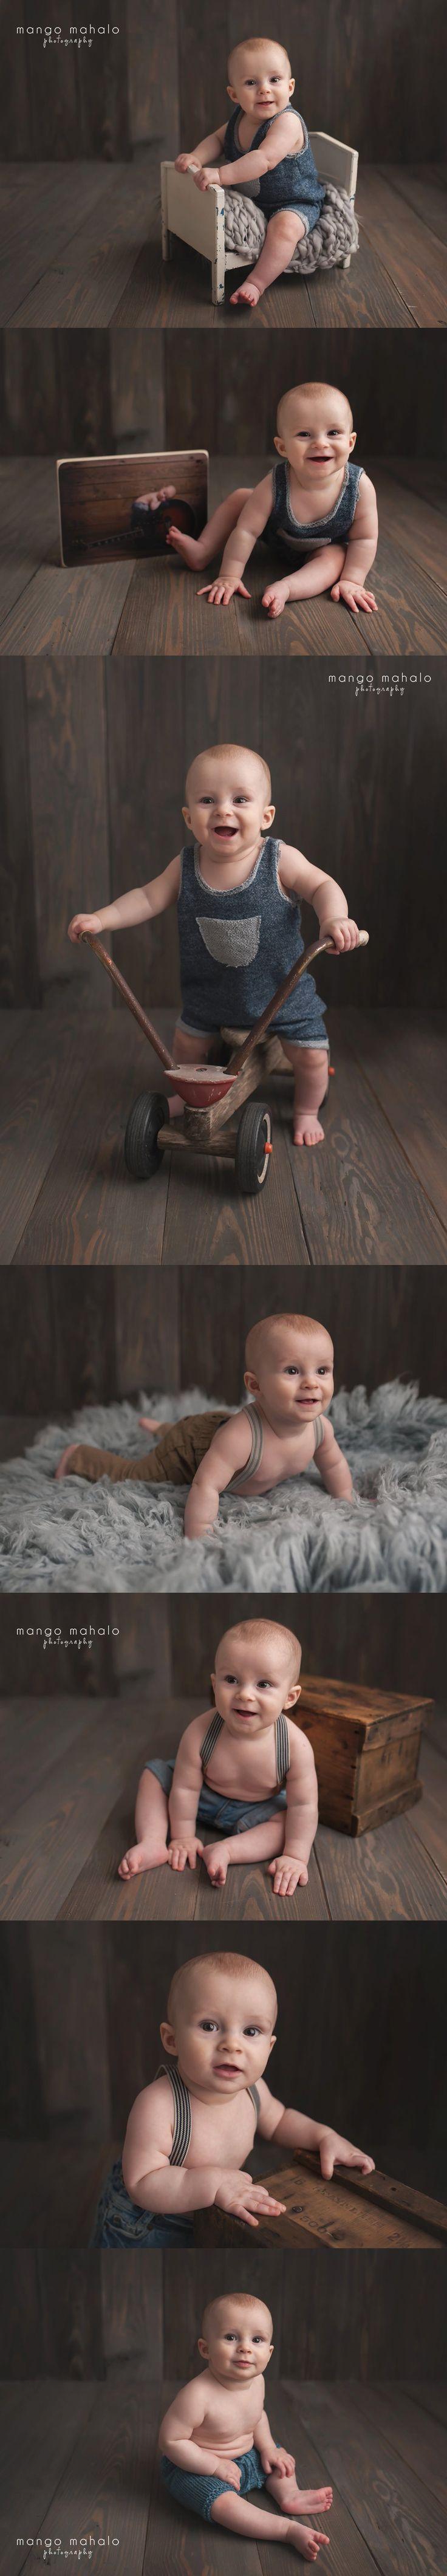 Knoxville Maternity, Newborn, Child & Family Photographer    Mango Mahalo Photography by Michelle Anderson    mangomahalo.com